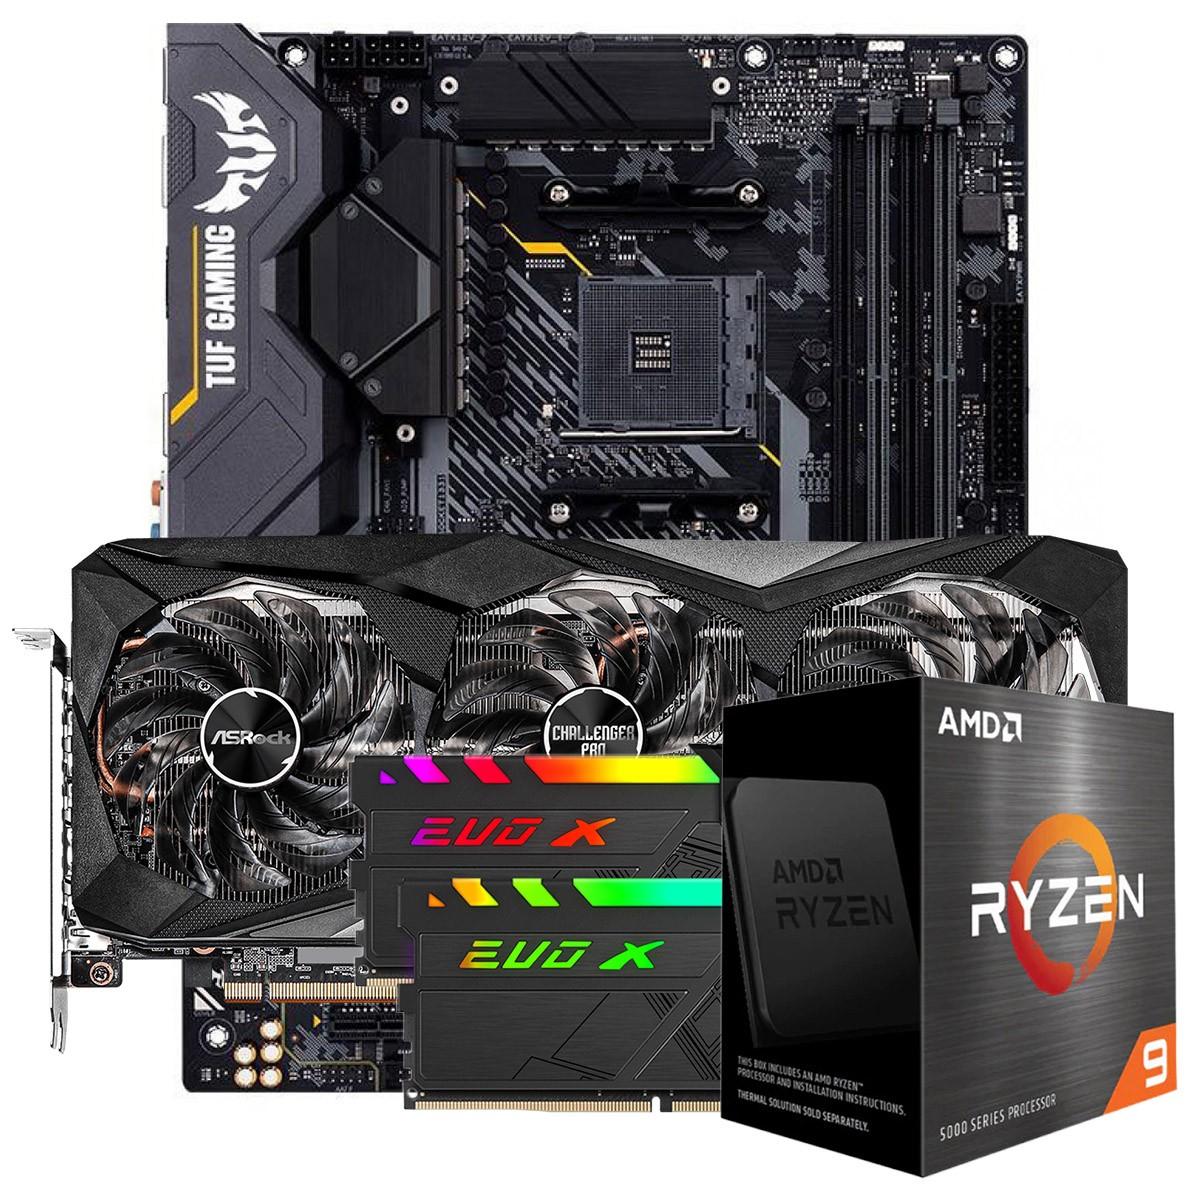 Kit Upgrade ASRock Radeon RX 6700 XT Challenger Pro OC + AMD Ryzen 9 5950X + ASUS TUF Gaming X570-Plus + Memória DDR4 16GB (2x8GB) 3600MHz